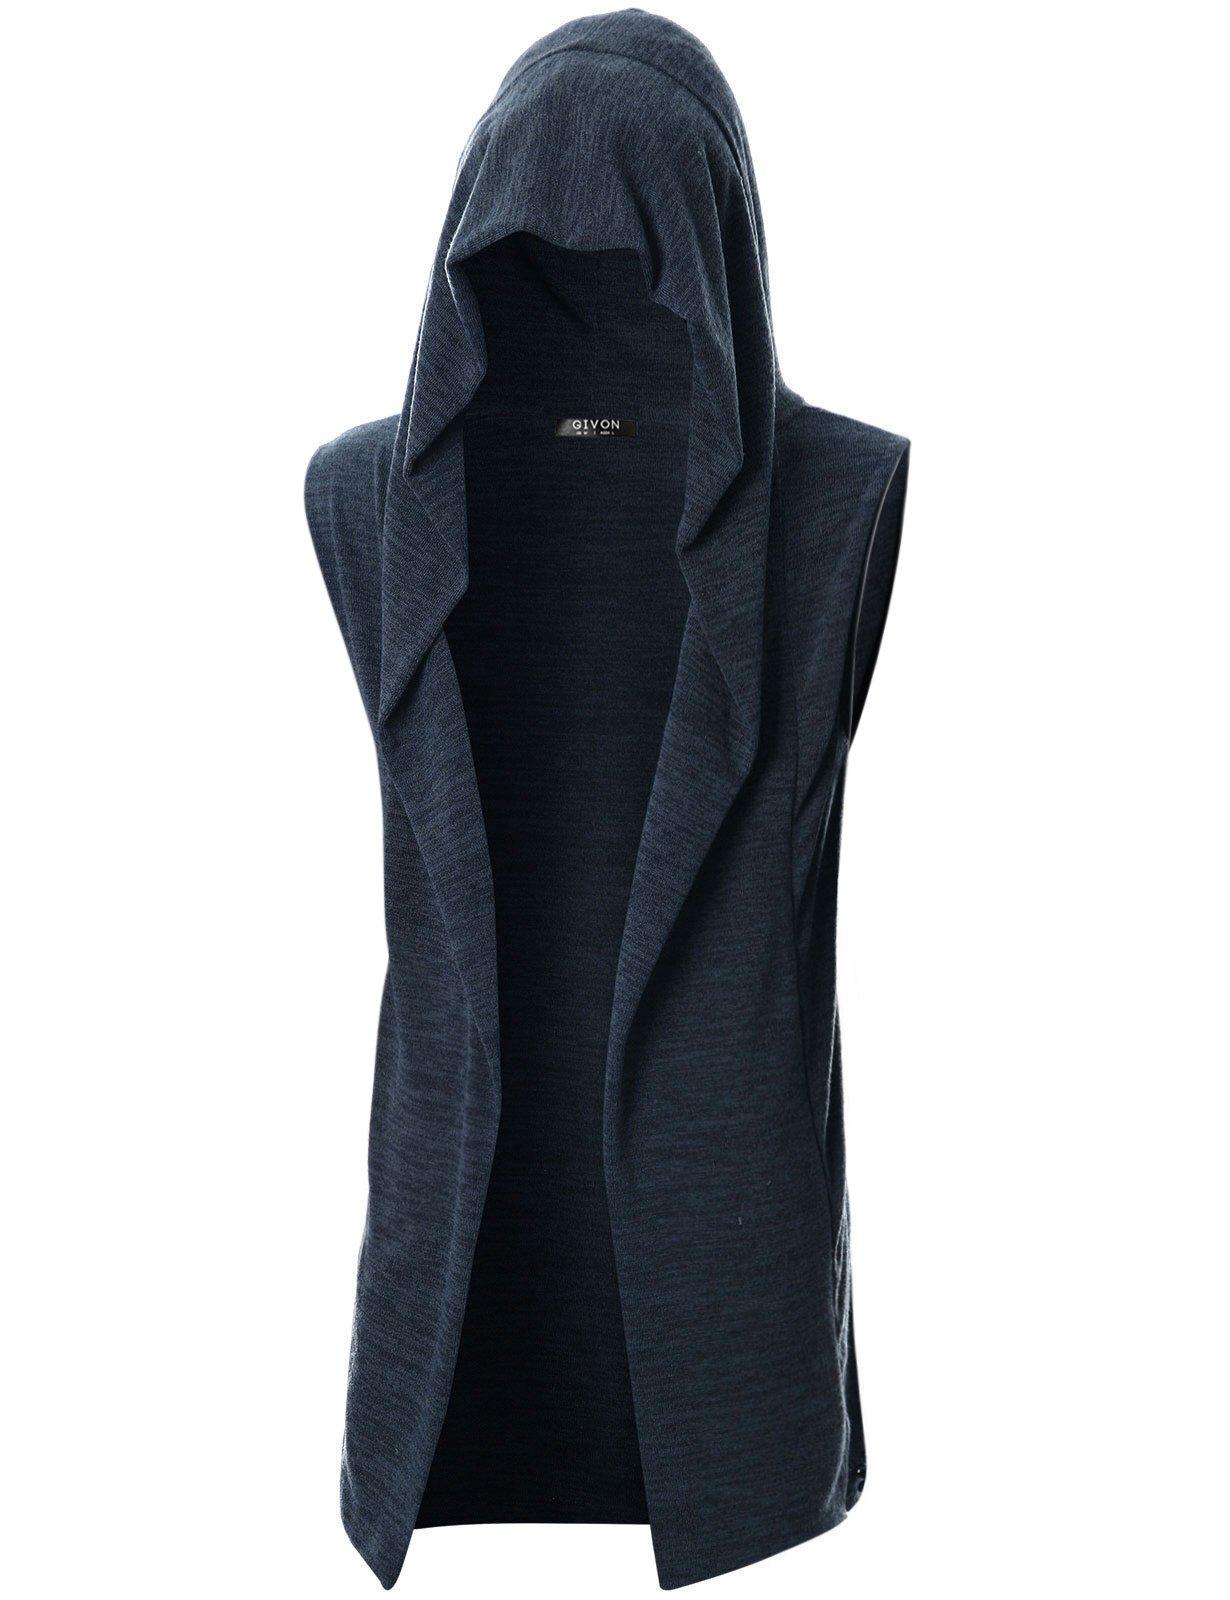 GIVON Mens Sleeveless Lightweight Ruffle Shawl Collar Cardigan with Pockets/DCC046-NAVY-M